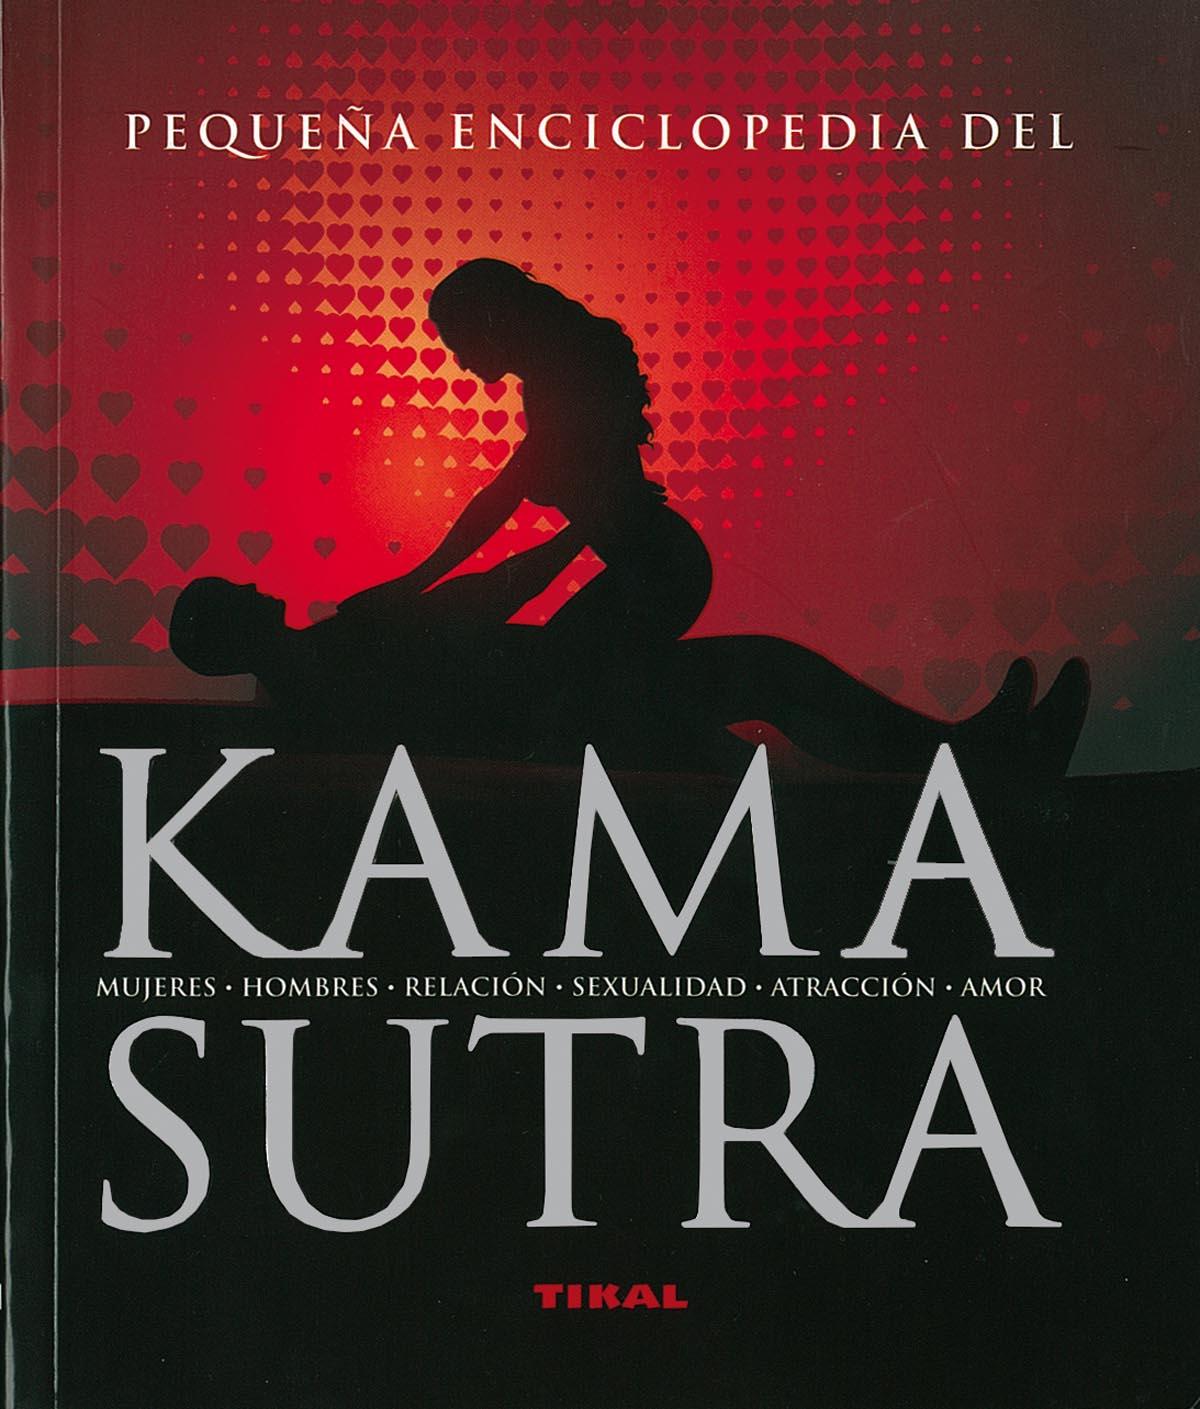 Kamasutra - Vv.aa.